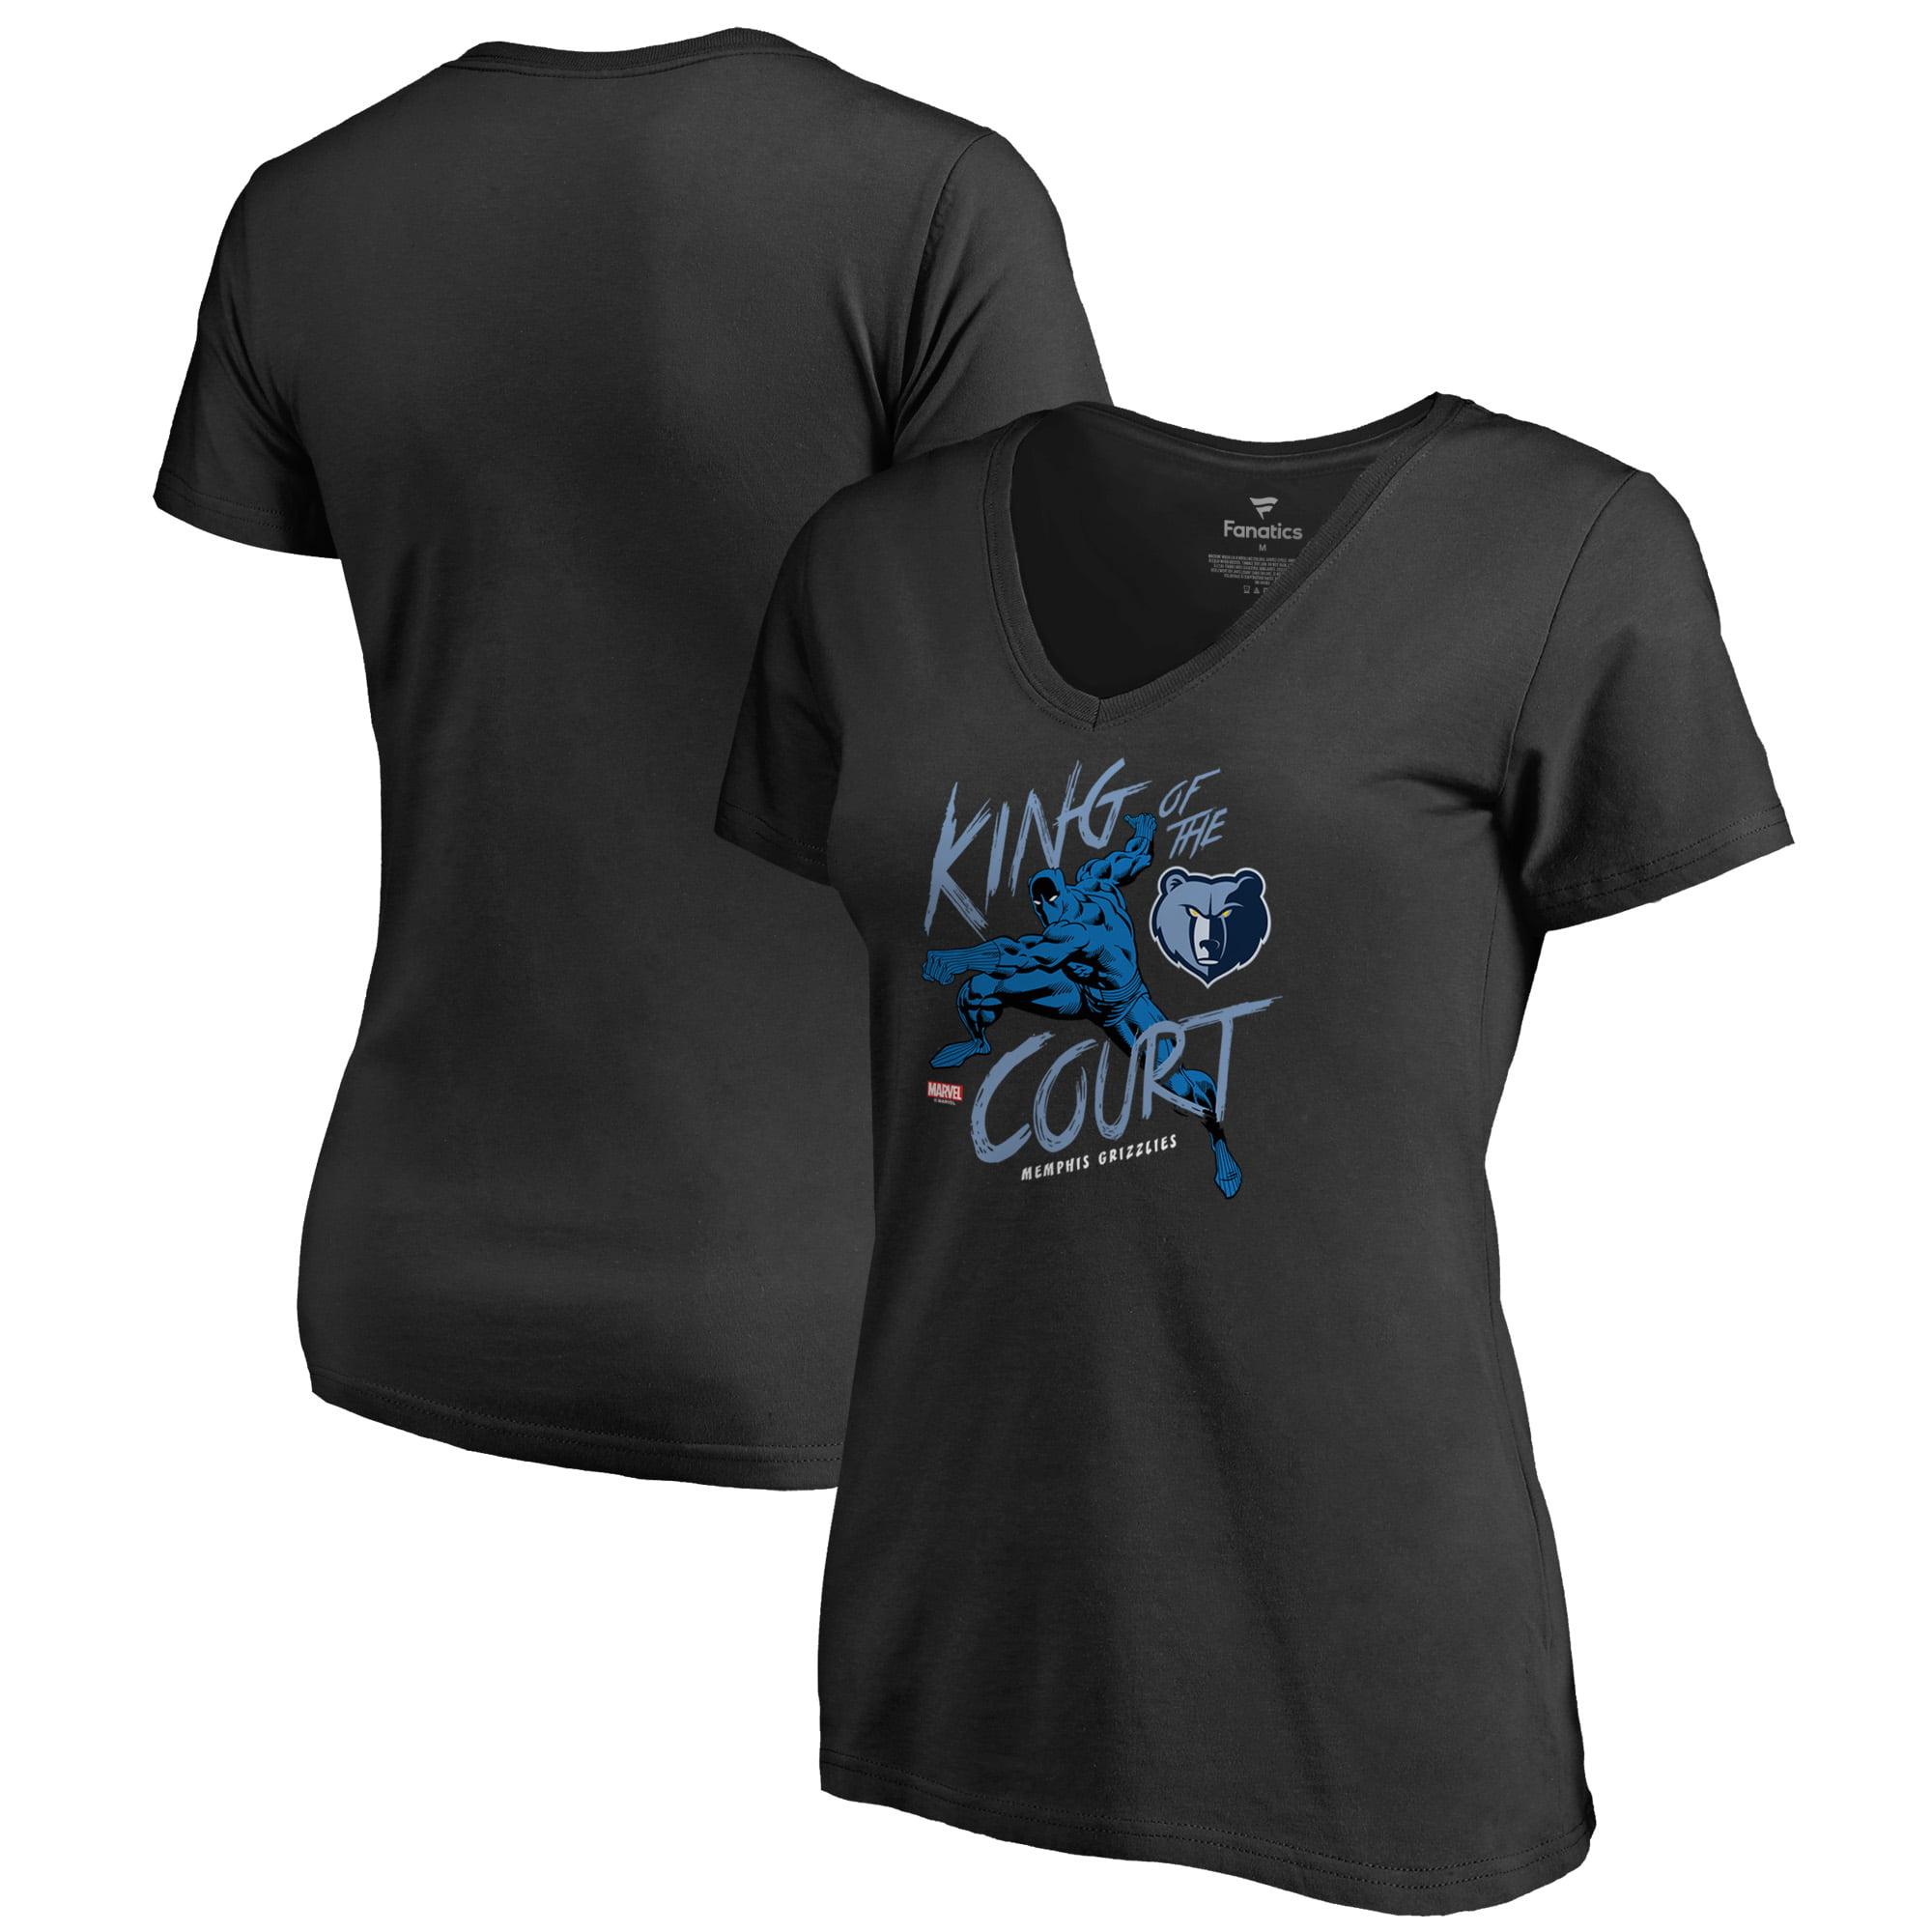 Memphis Grizzlies Fanatics Branded Women's Marvel Black Panther King of the Court V-Neck T-Shirt - Black